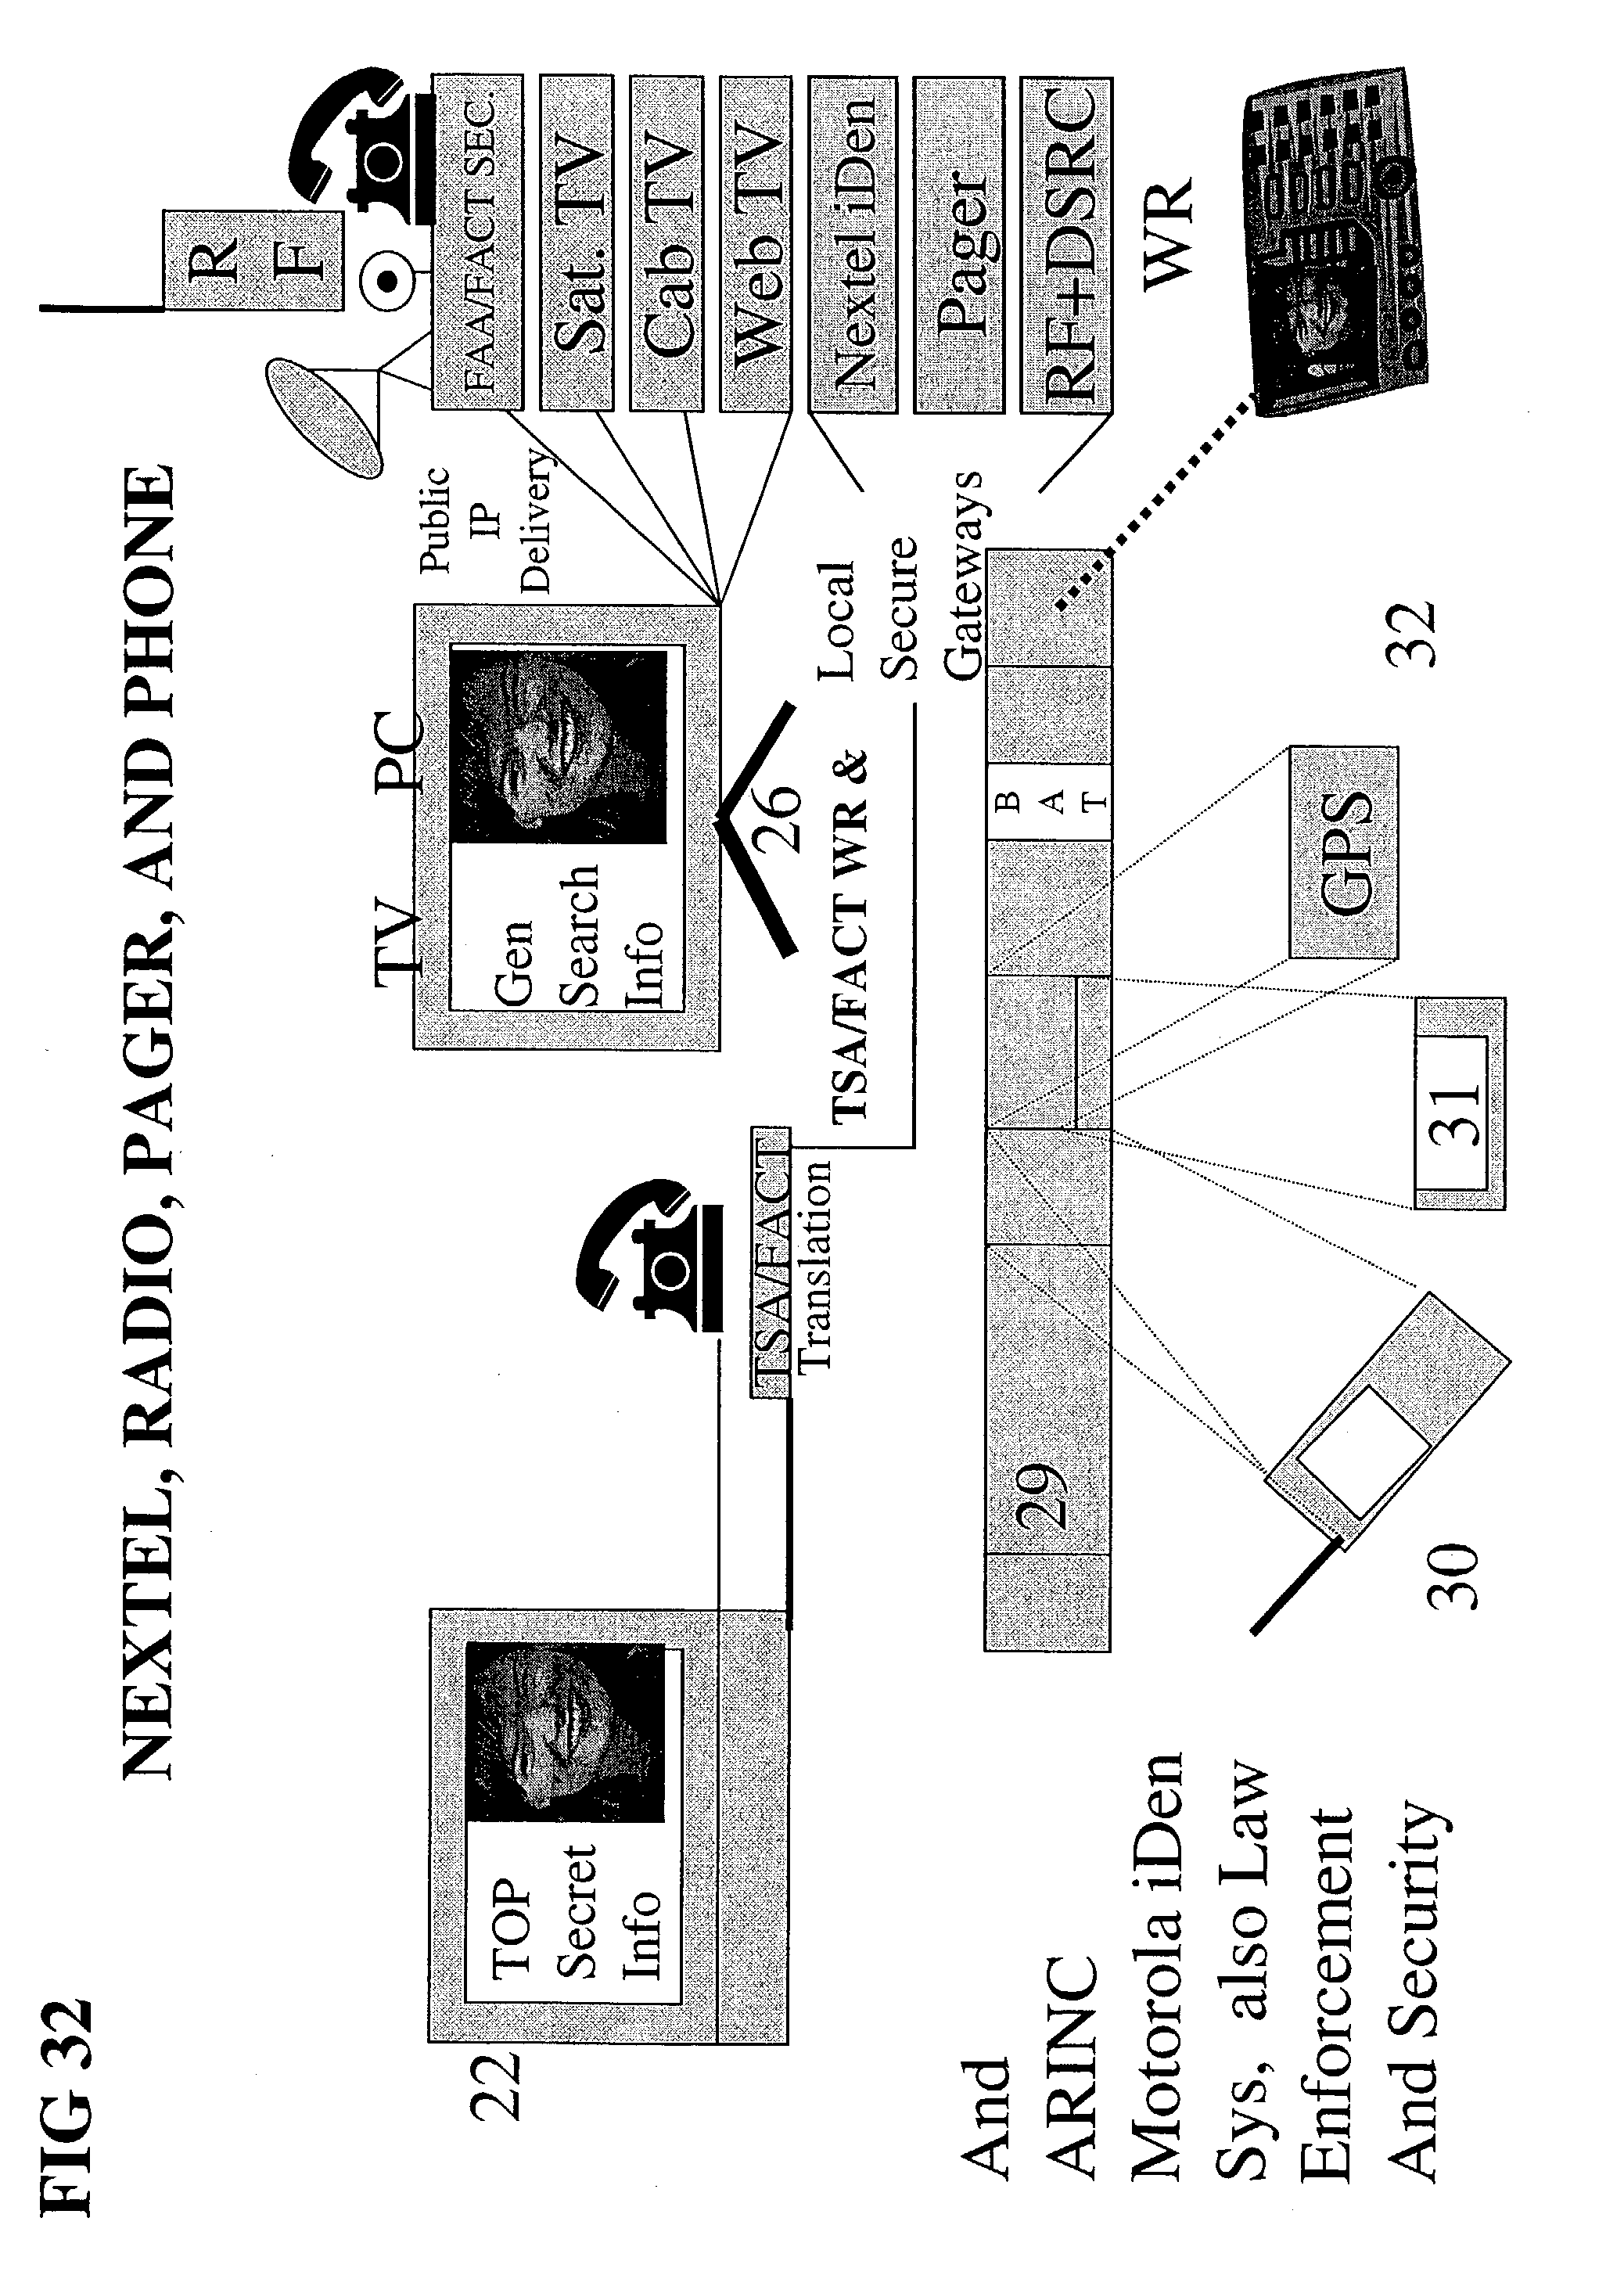 Patent Us 20030093187a1 Volvo Motorola Alternator External Regulator Wiring Diagram Images